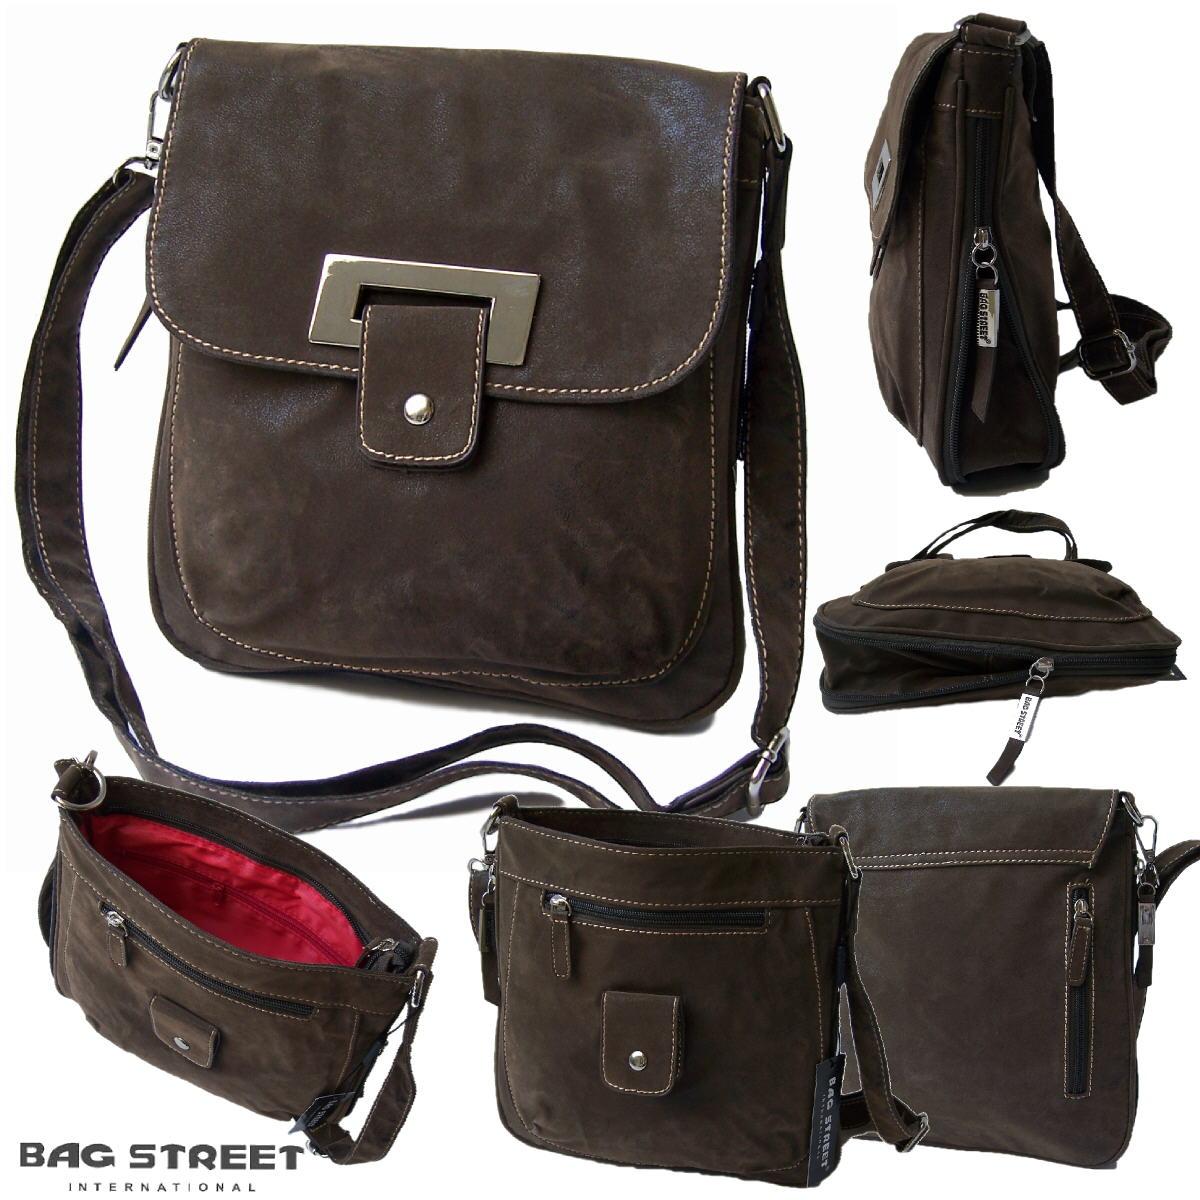 Tasche Umhängetasche Handtasche Leder-Look braun Bag Street Ta6040